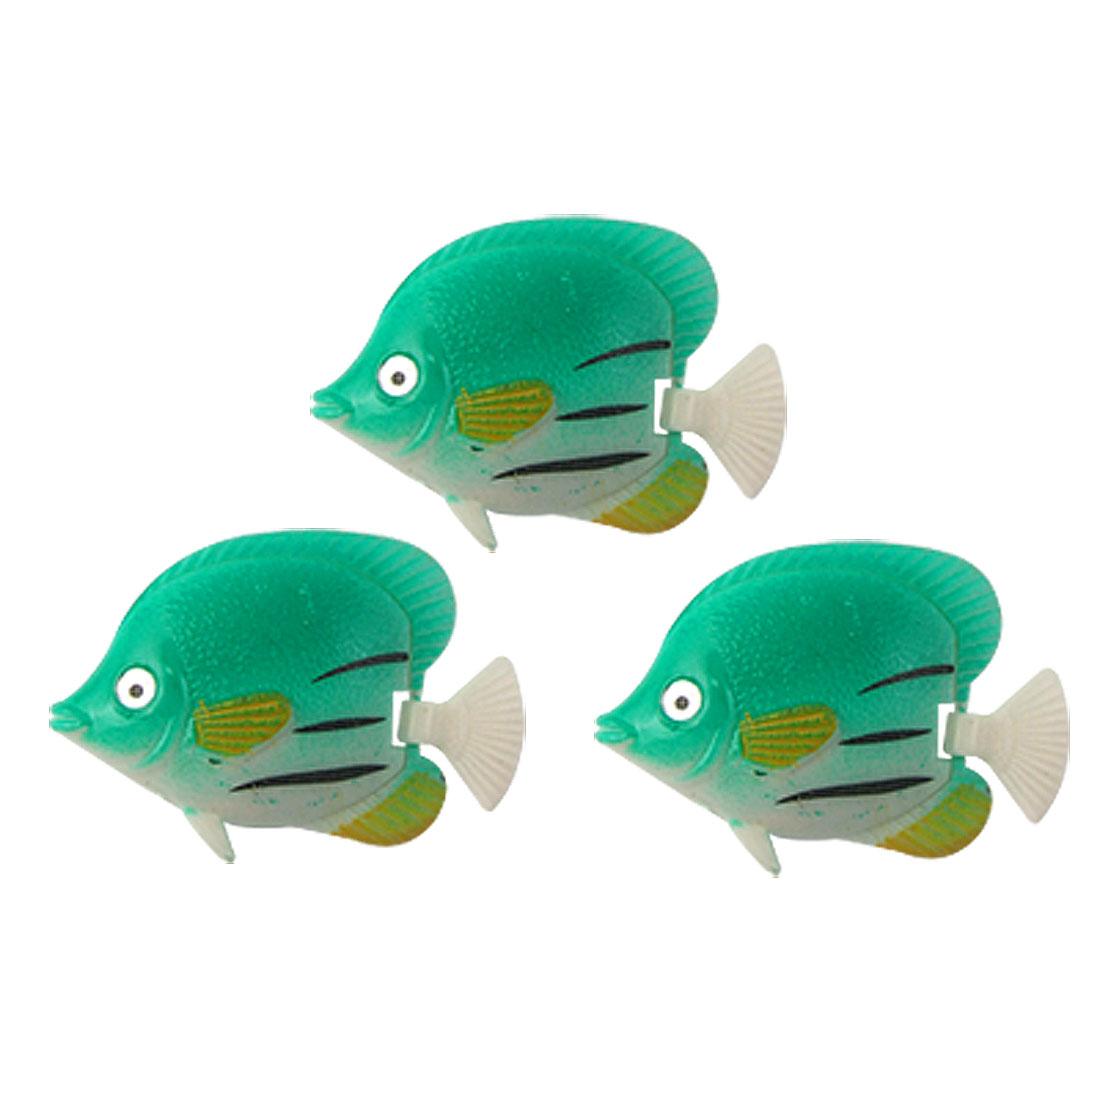 Aquarium Tank Green Plastic Simulated Tropical Fish Decor 3 Pcs